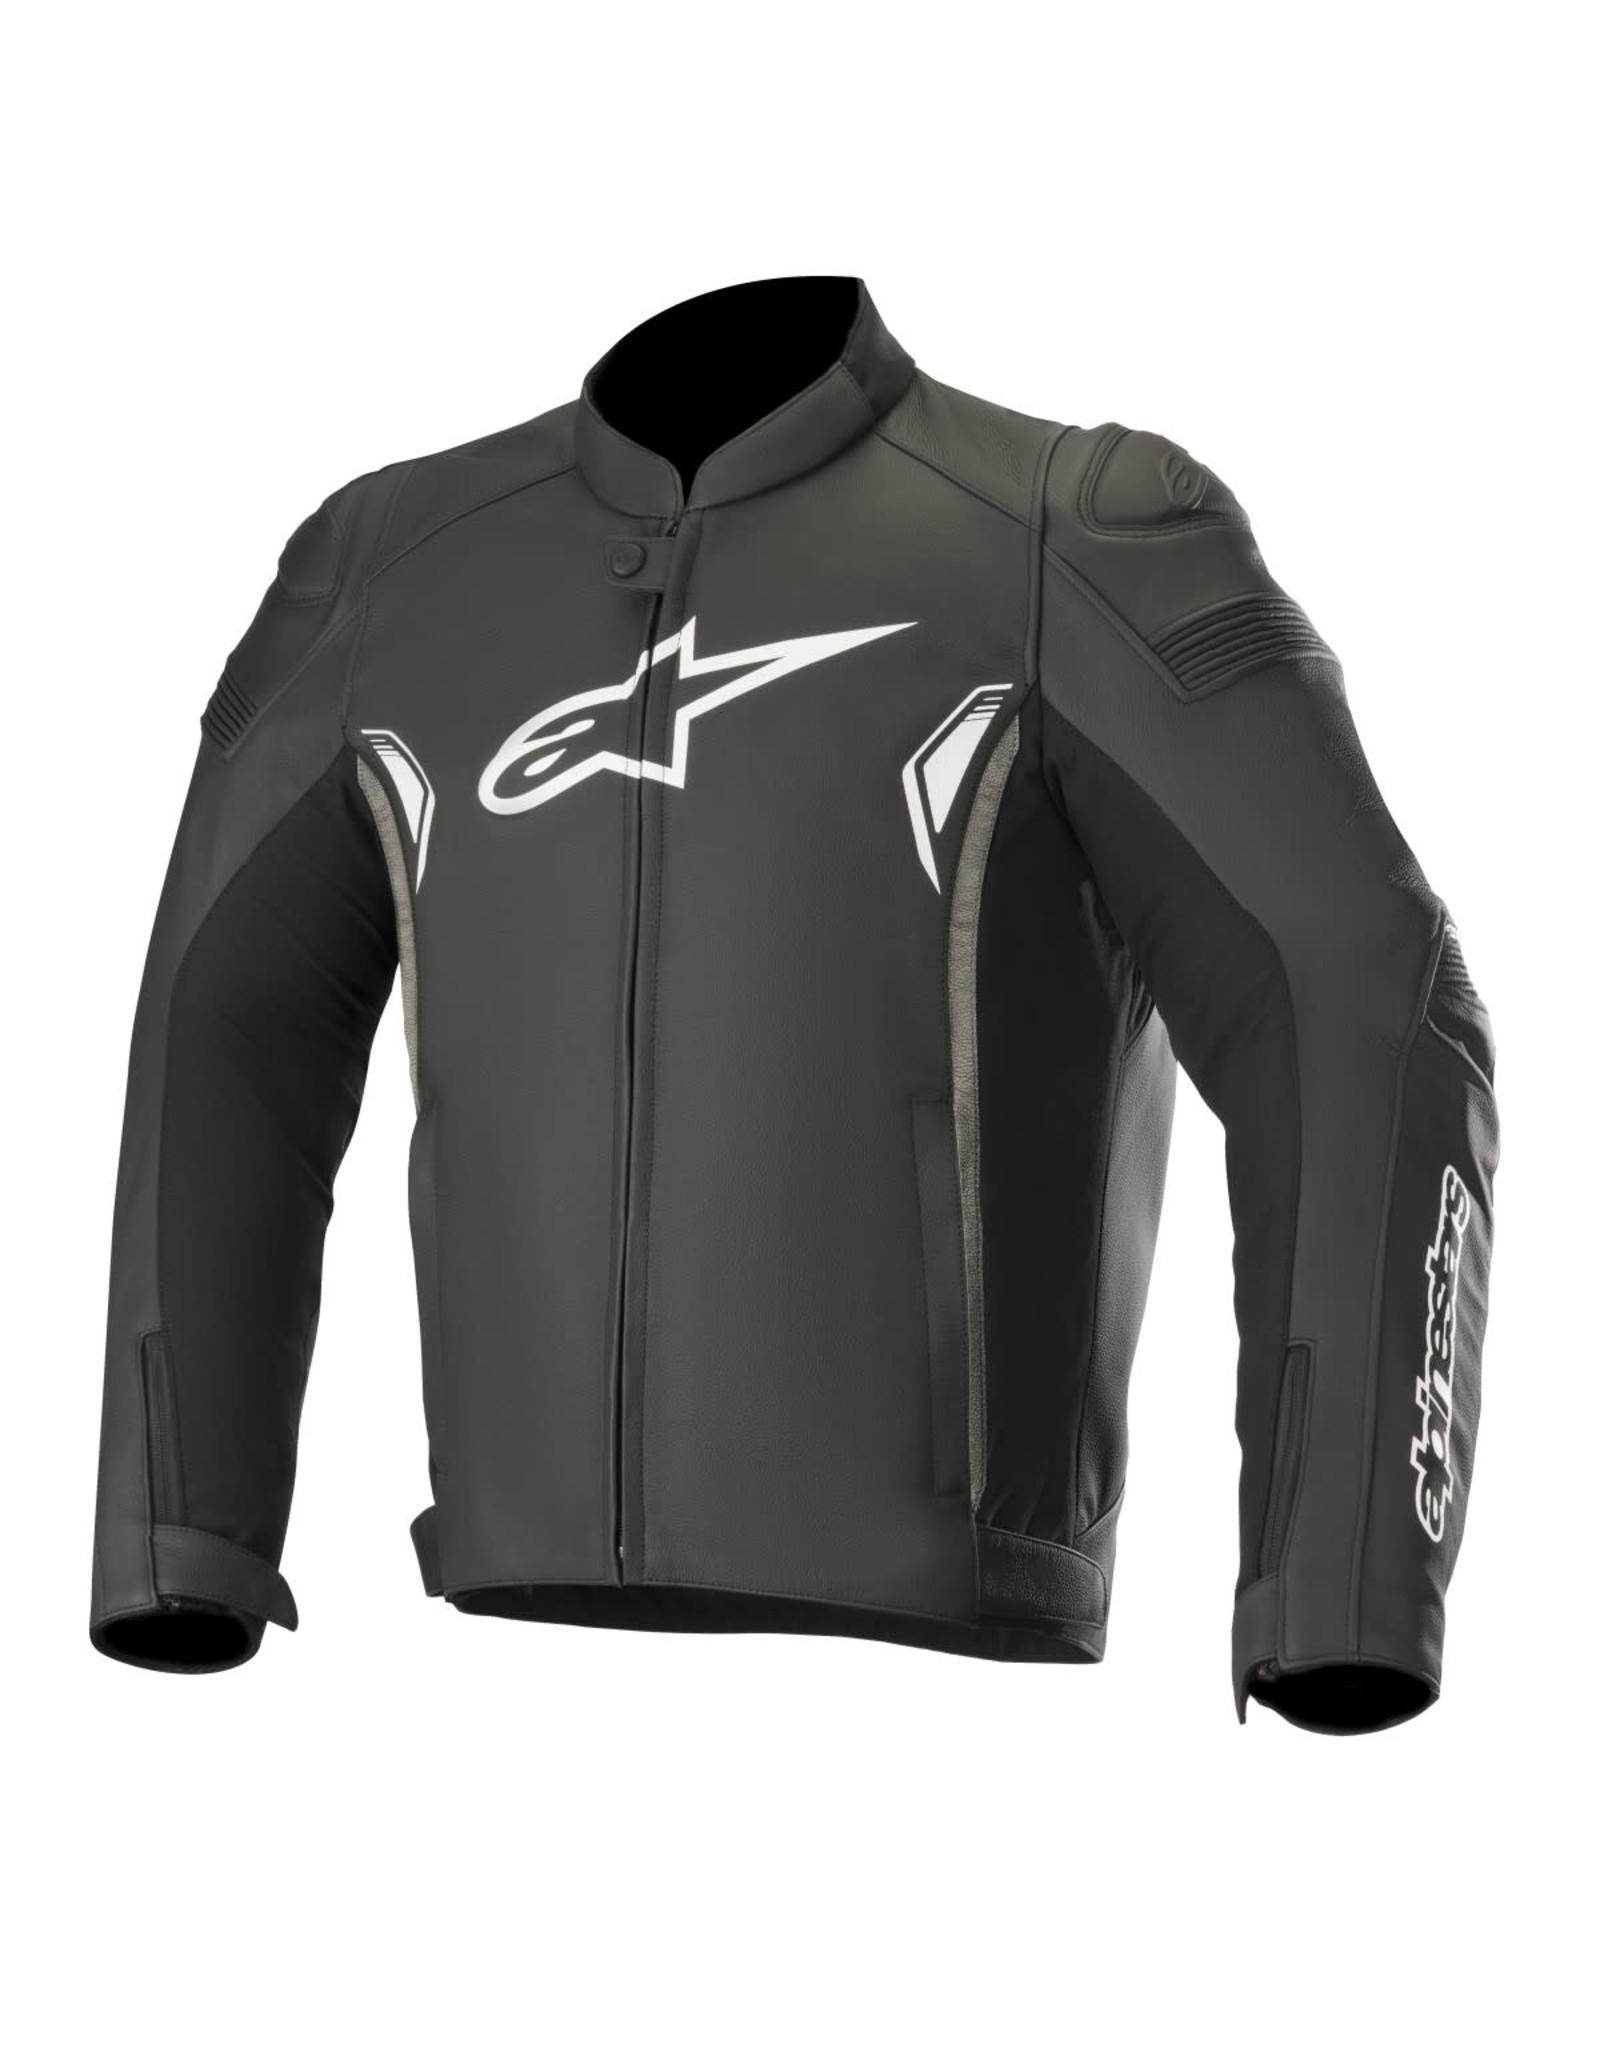 Alpinestars Alpinestars SP-1 v2 Leather Riding Jacket